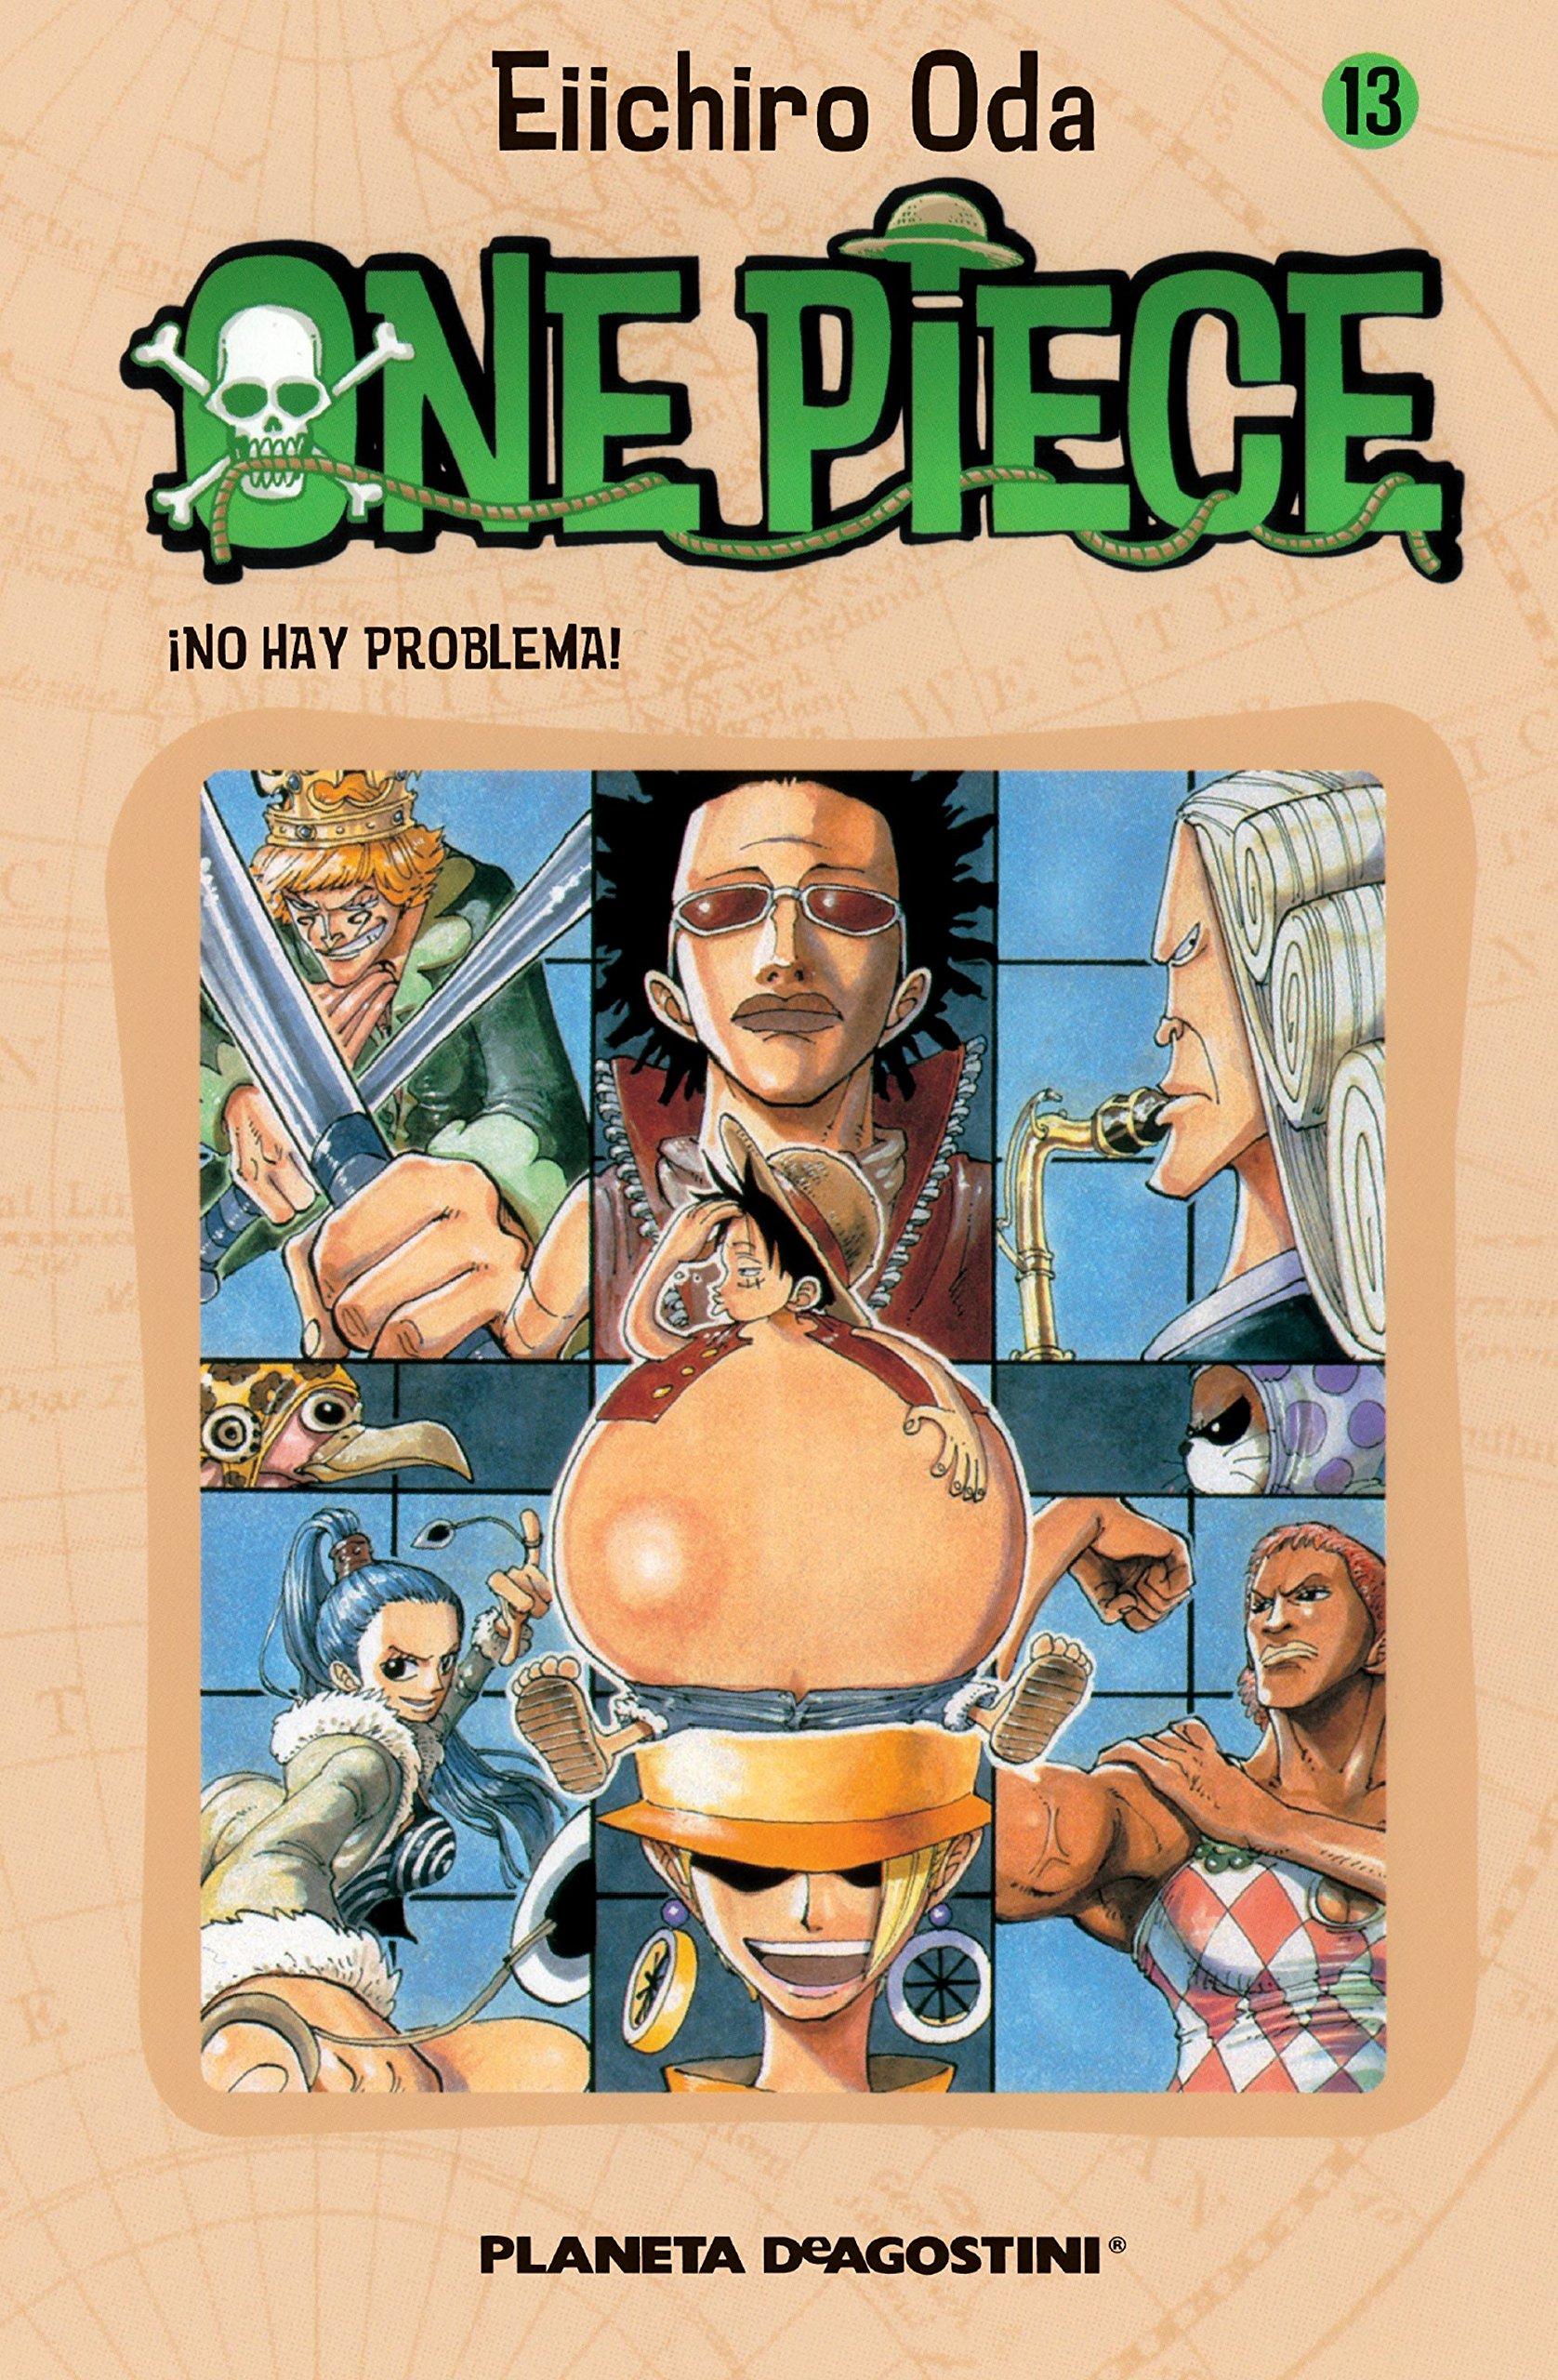 One Piece nº 13: ¡No hay problema! (Manga Shonen) Tapa blanda – 29 abr 2005 Eiichiro Oda Planeta DeAgostini Cómics 846847164X Graphic novels: Manga